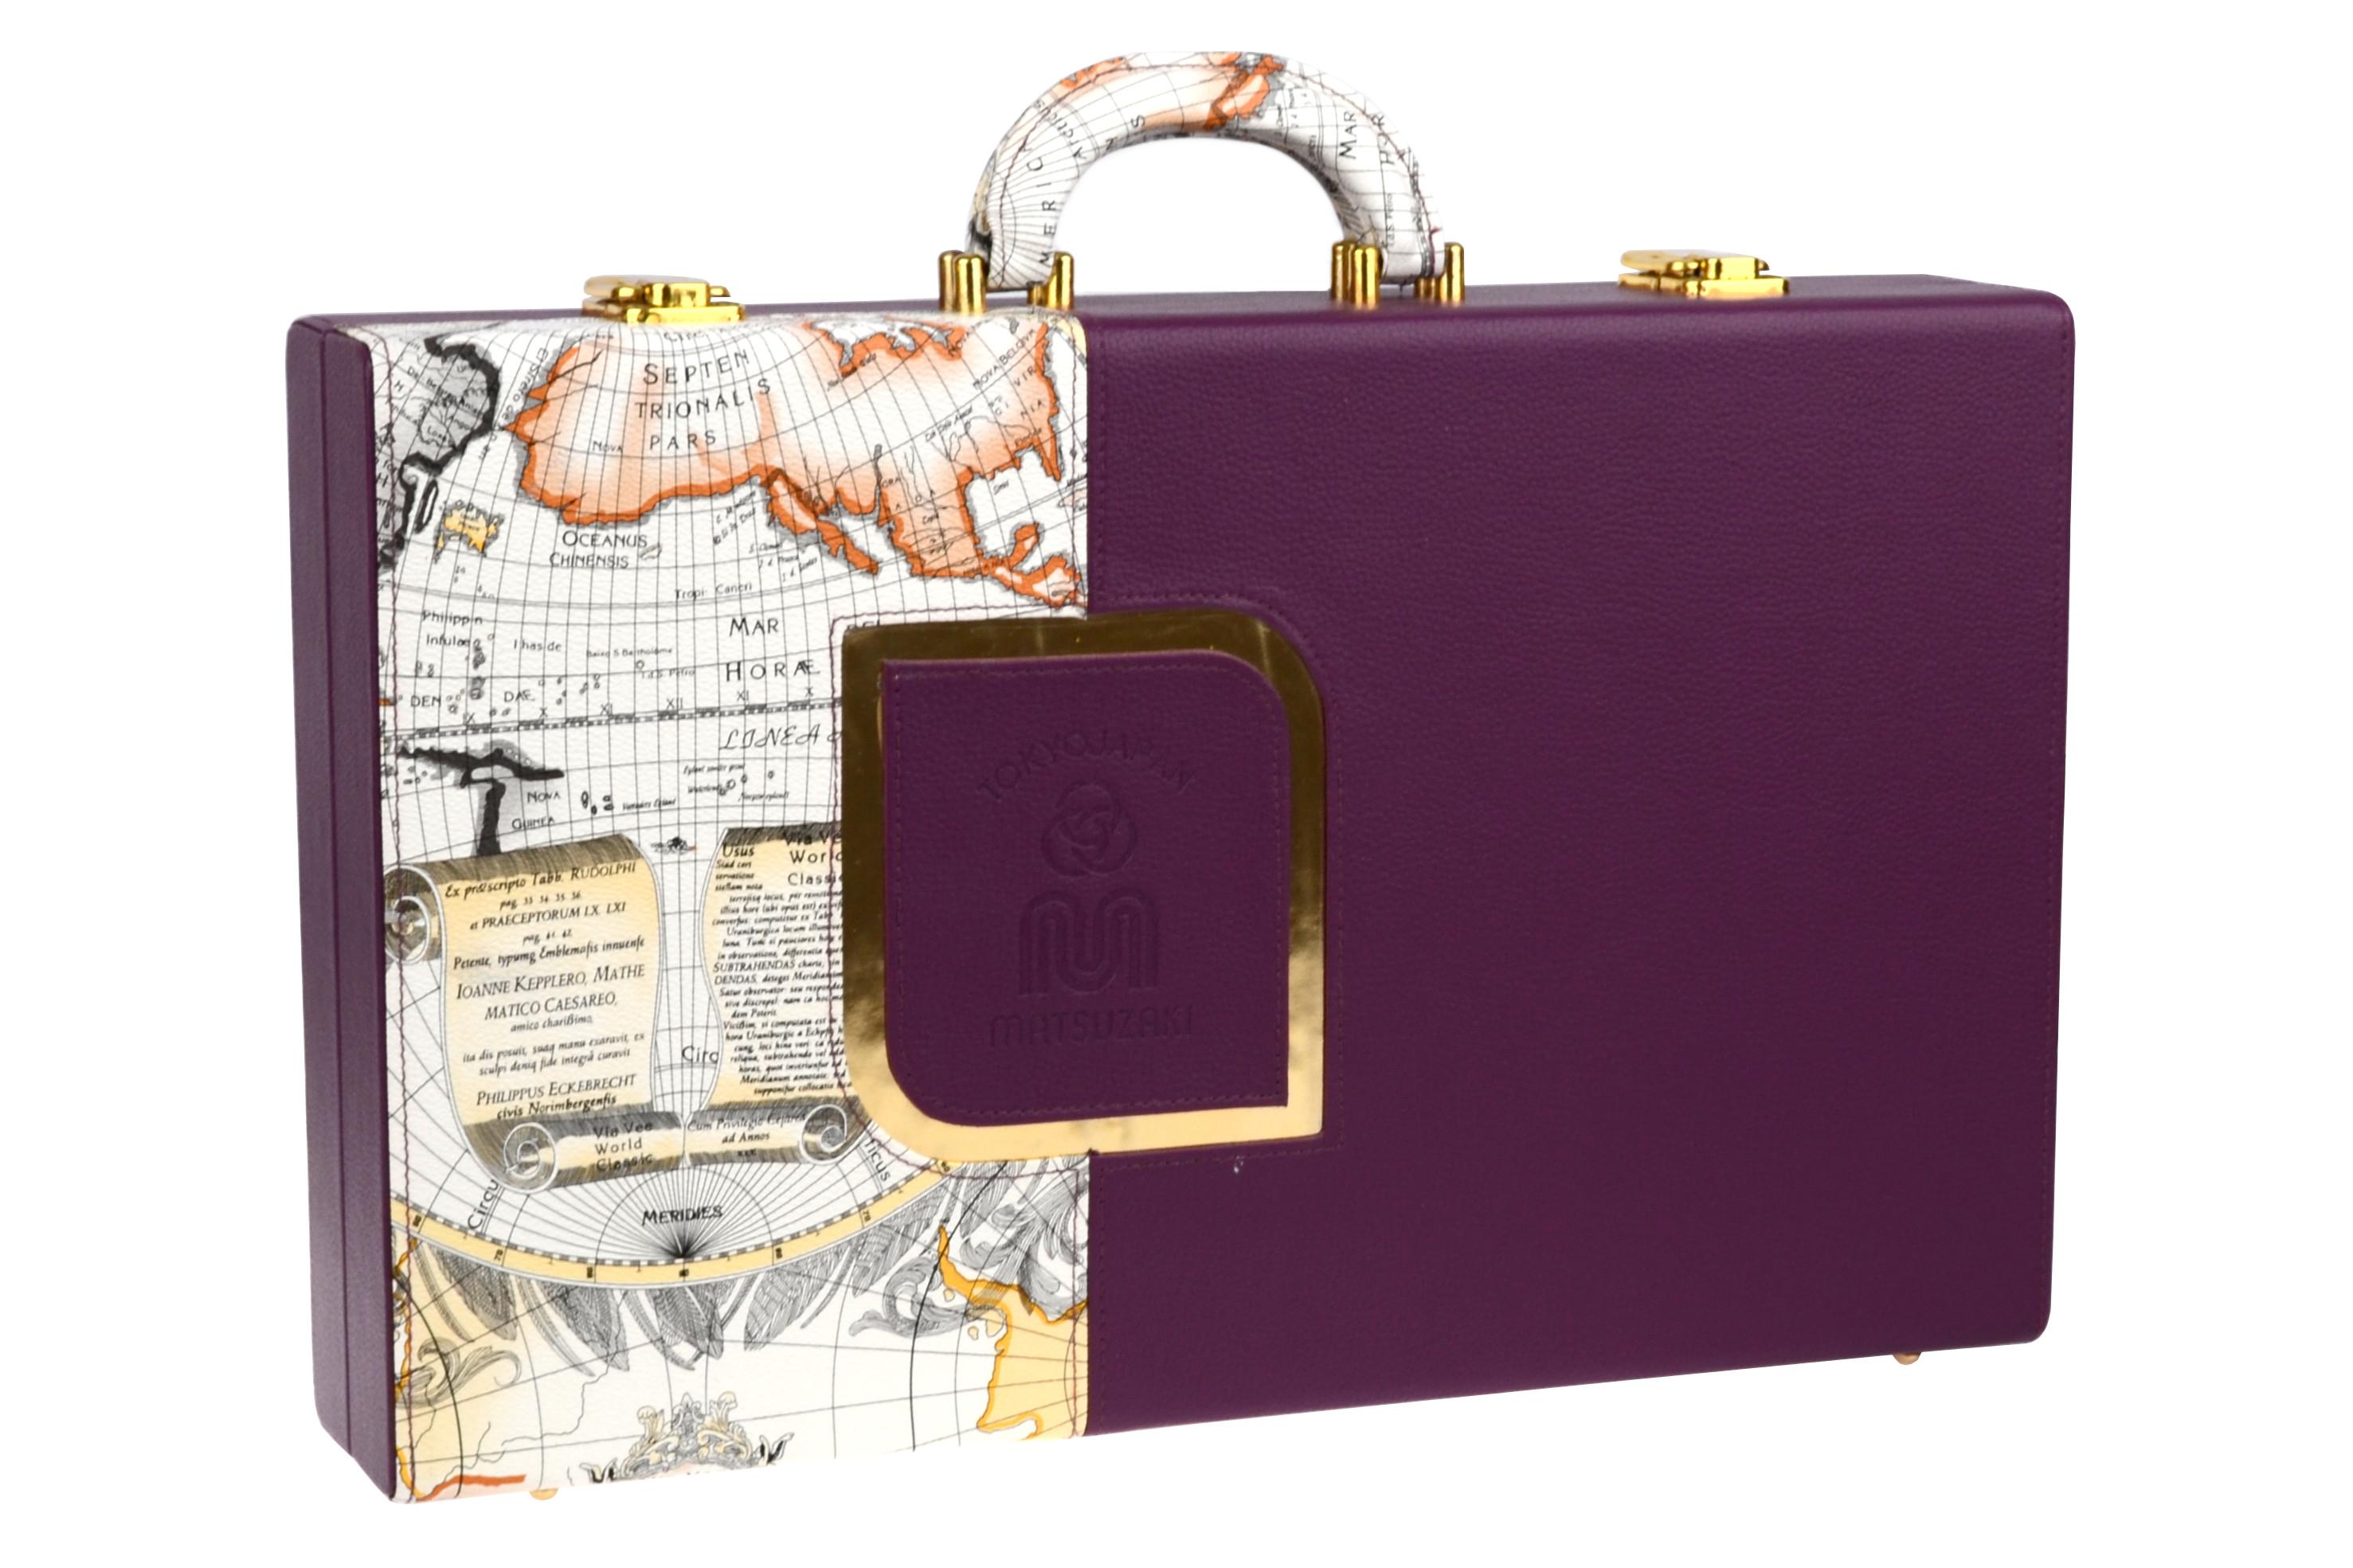 Kadeřnický kufr Matsuzaki - fialový (800118) + DÁREK ZDARMA